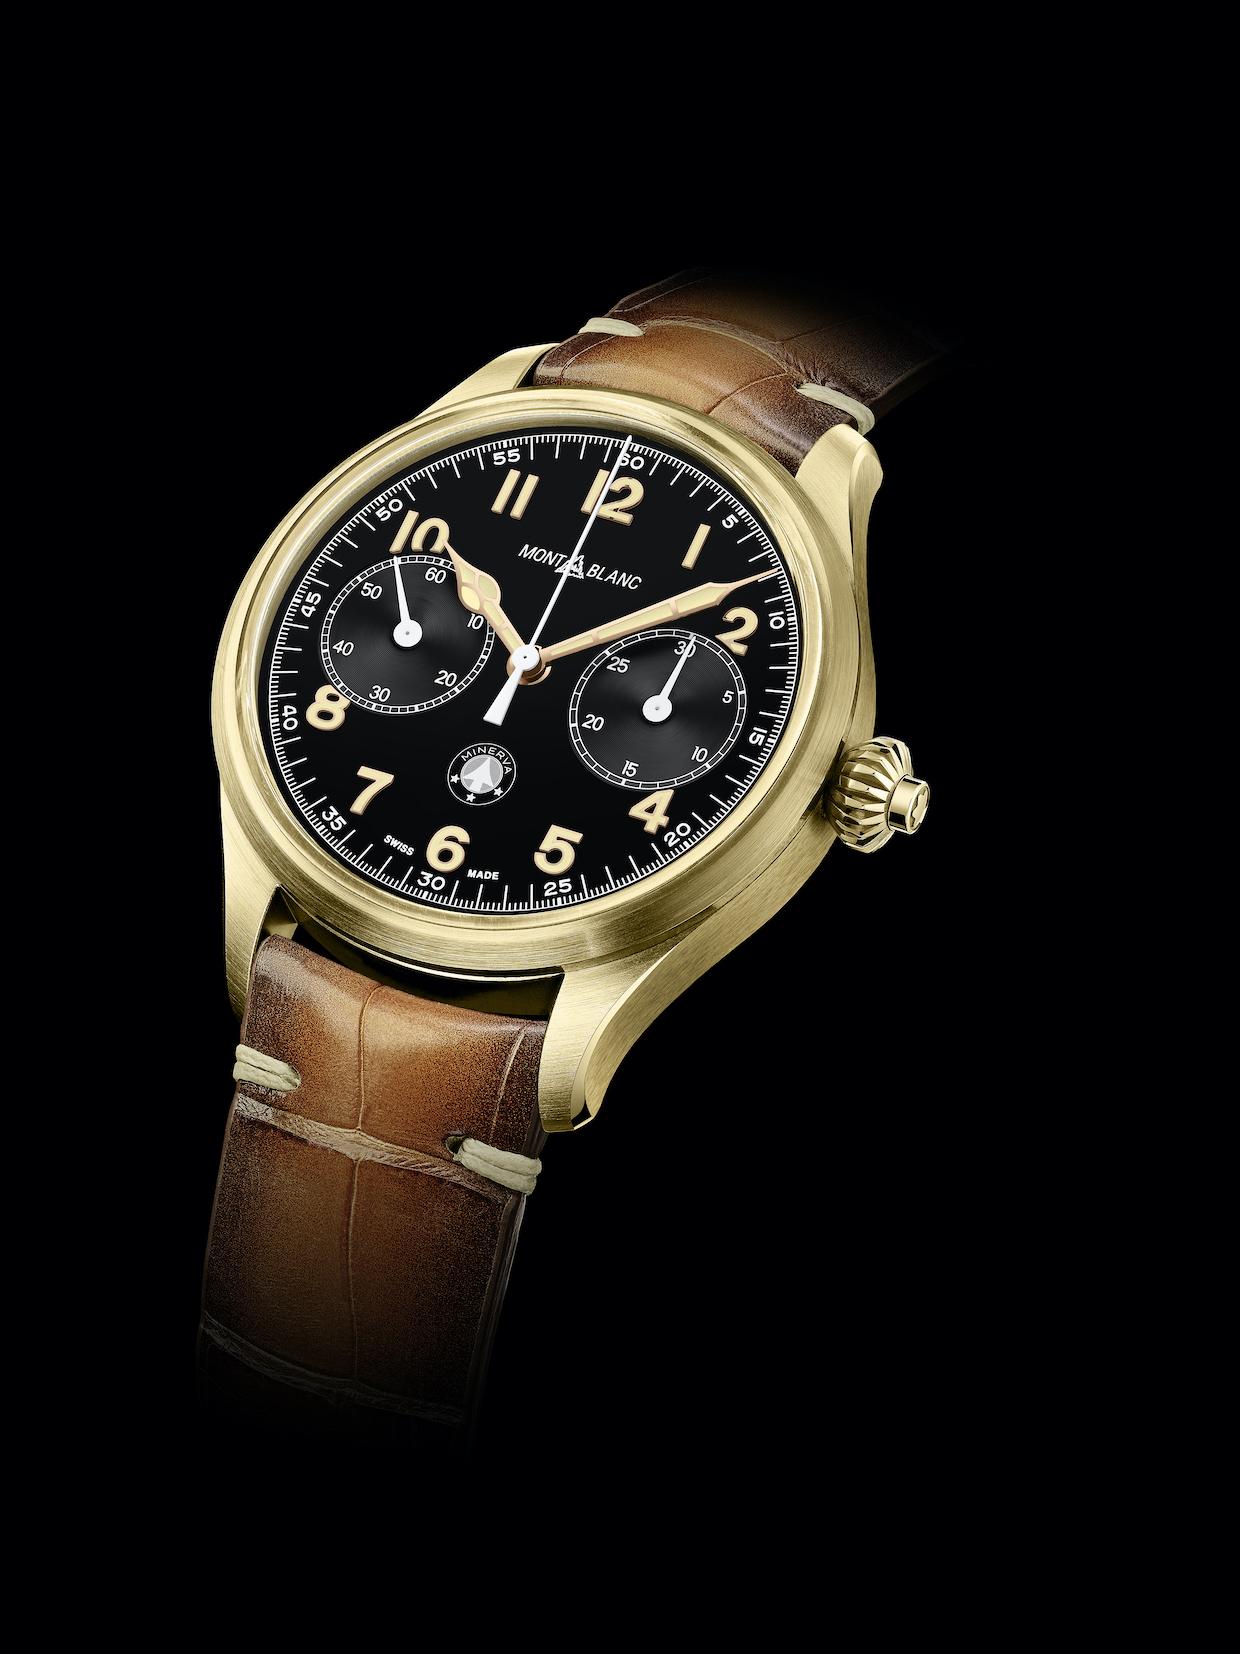 Montblanc 1858 Monopusher Chronograph Origins watch